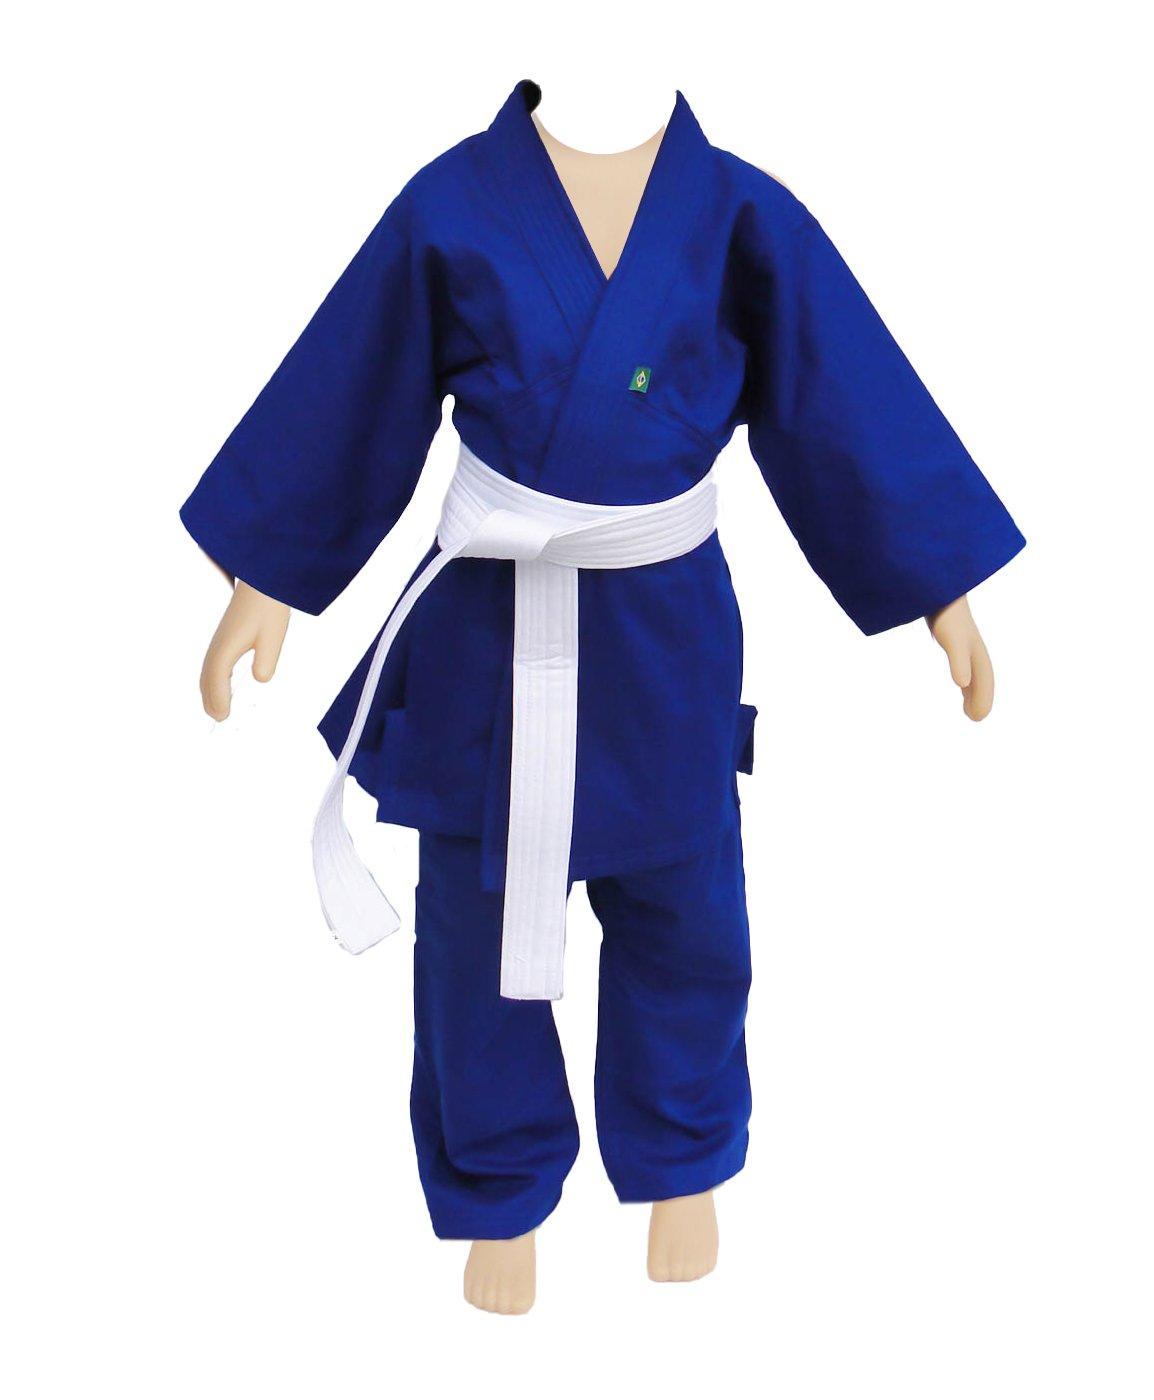 judo frente 1.jpg